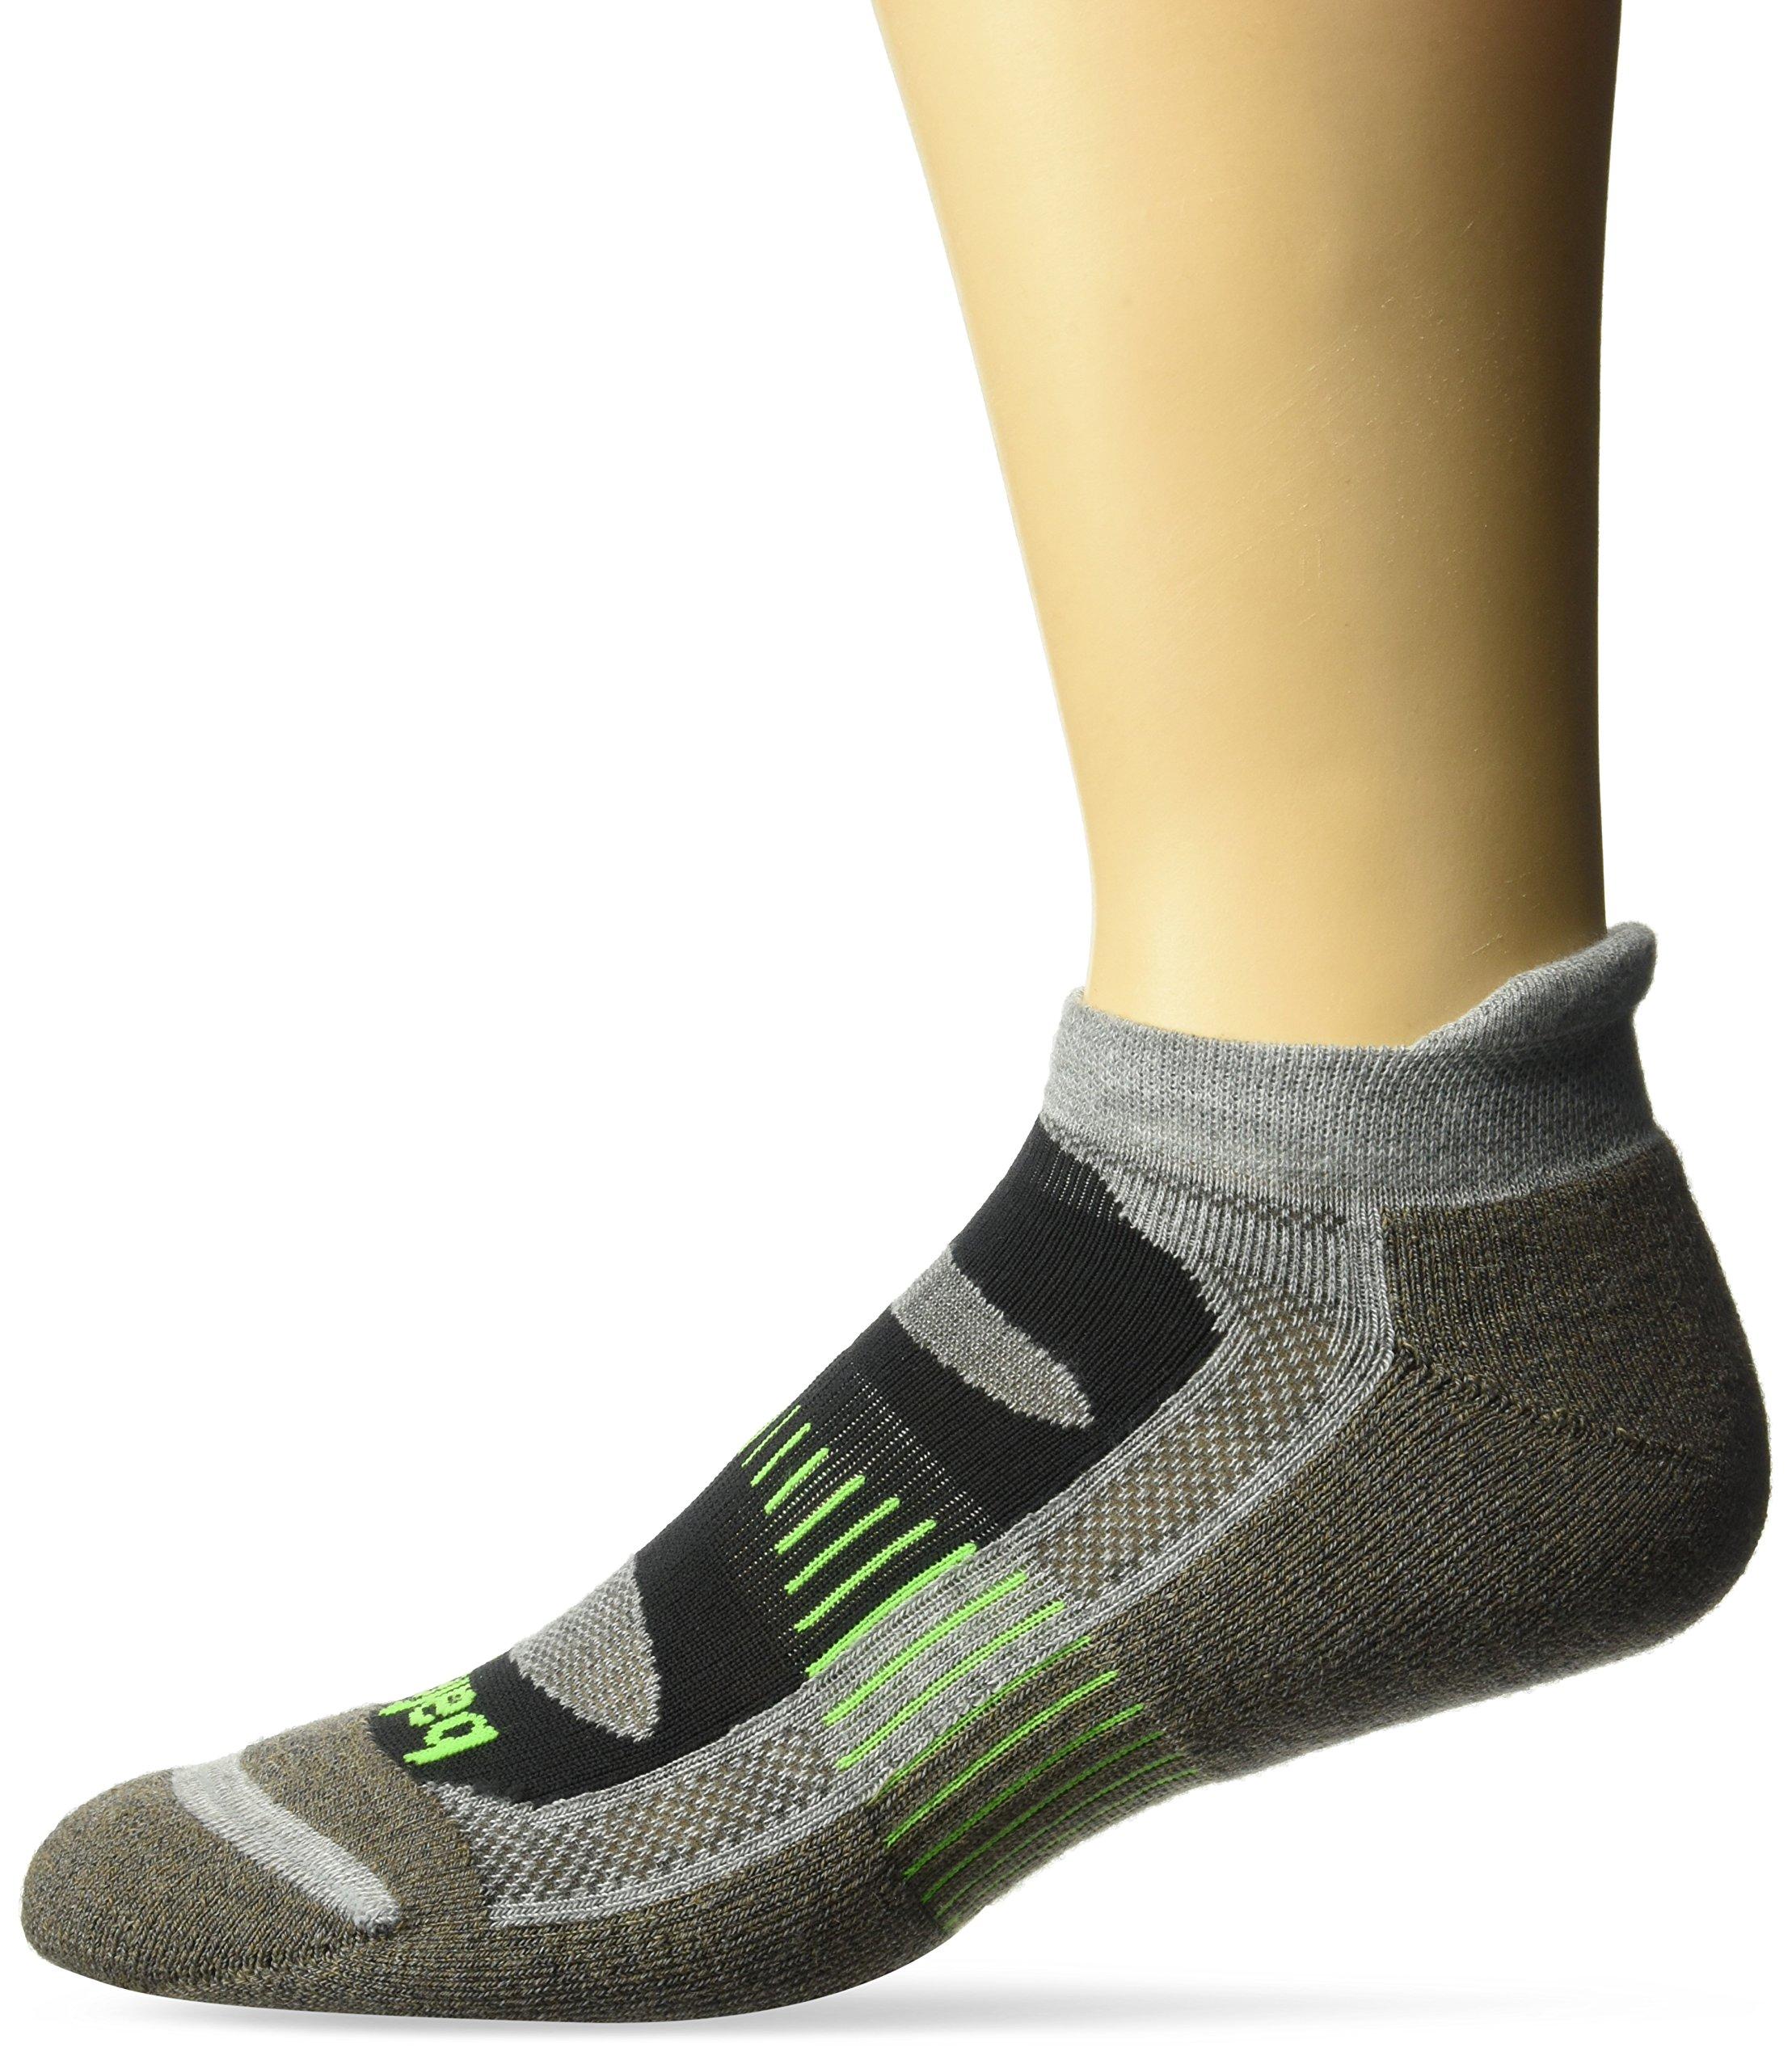 Balega Blister Resist No Show Socks for Men and Women (1-Pair), Mink/Grey, Medium